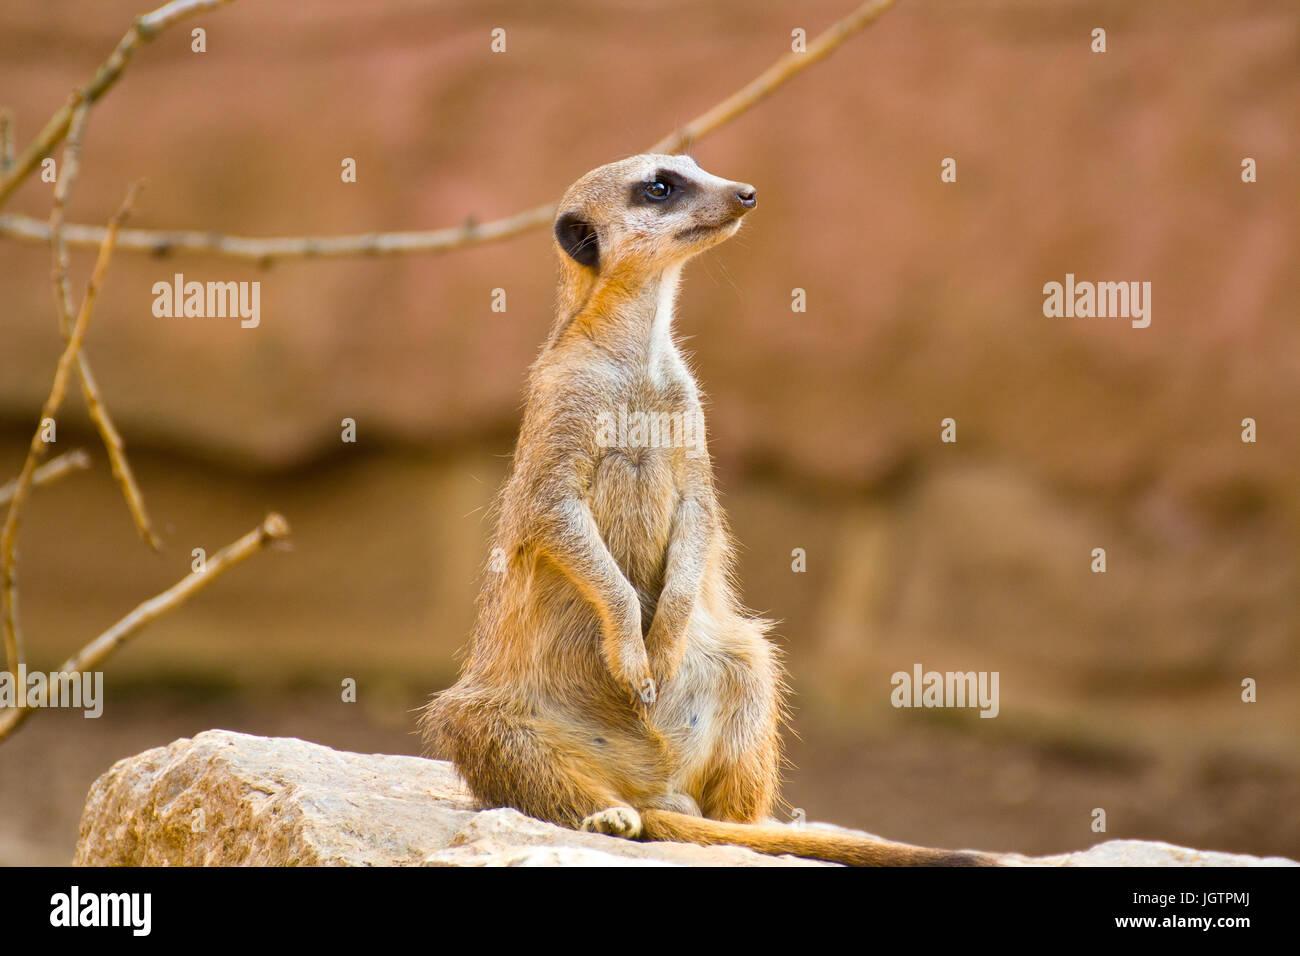 A Meerkat - Stock Image